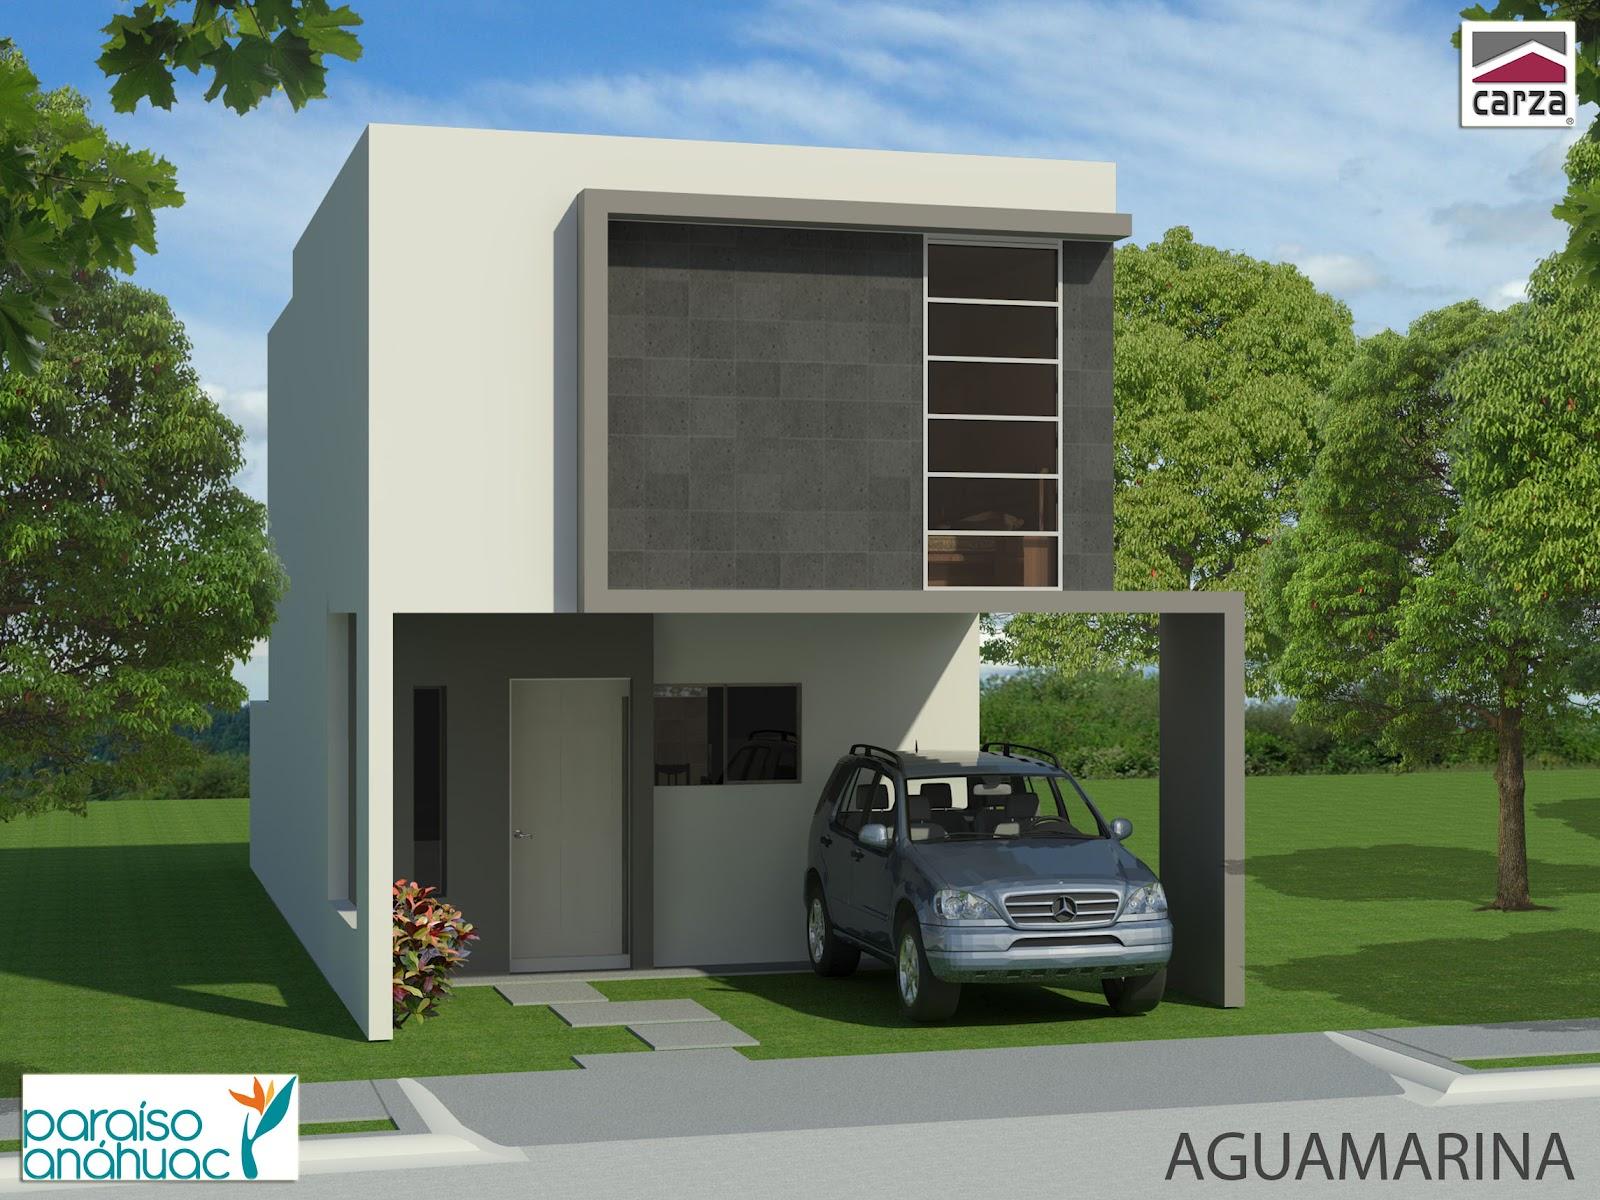 Fachadas contempor neas fachadas contempor neas de fracc for Fachadas de casas contemporaneas modernas